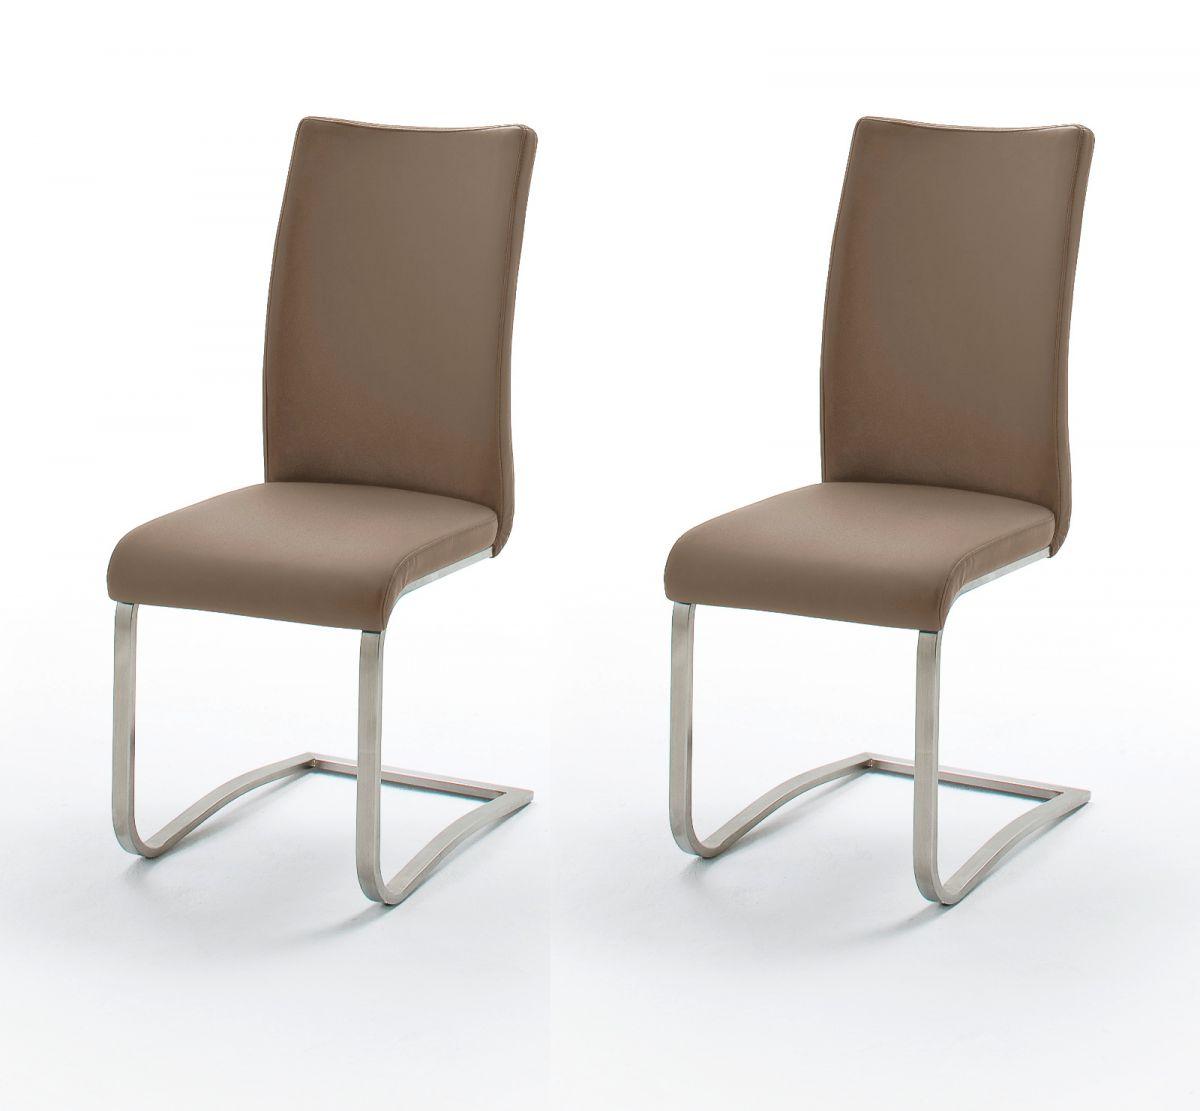 2 x Stuhl Arco Cappuccino Freischwinger Leder